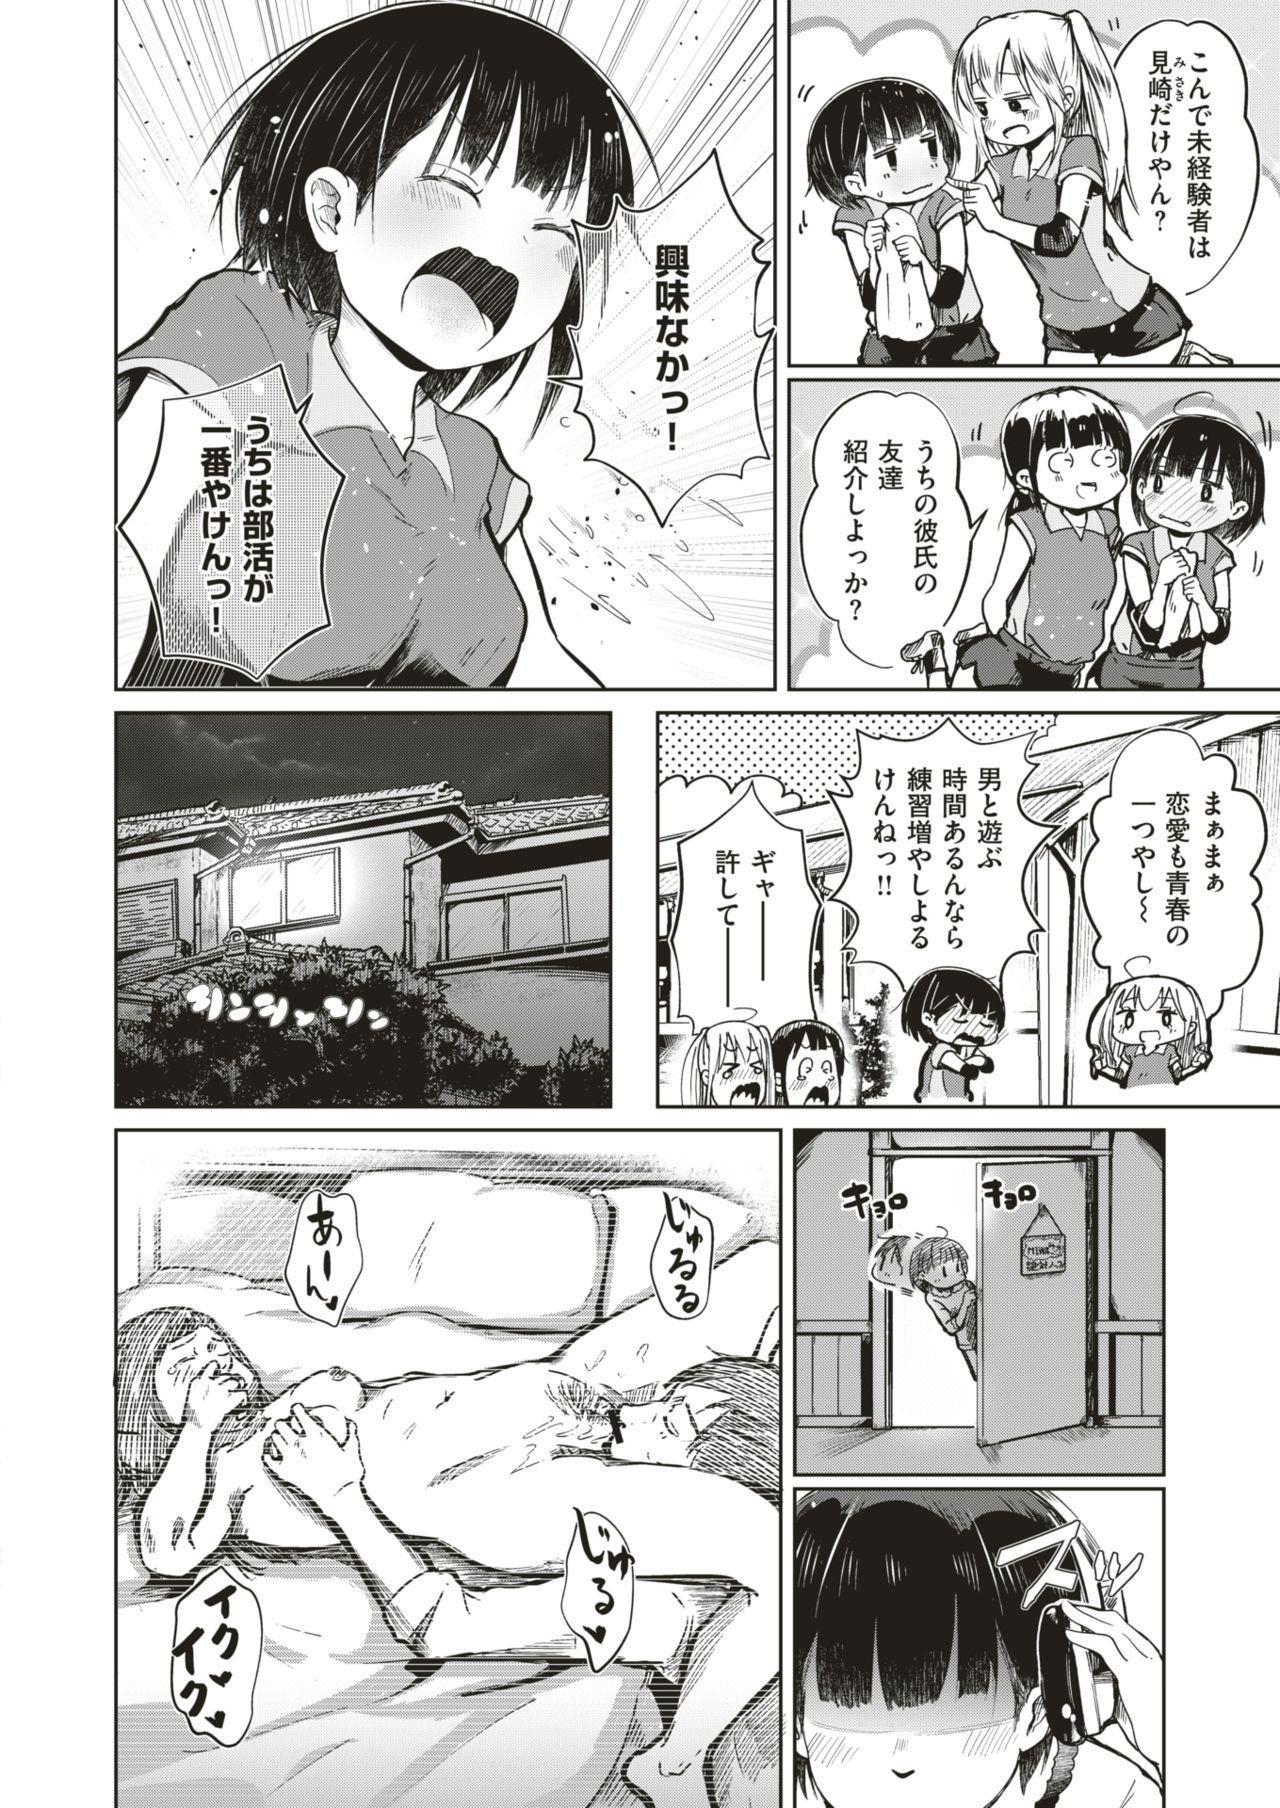 COMIC HAPPINING Vol. 4 108